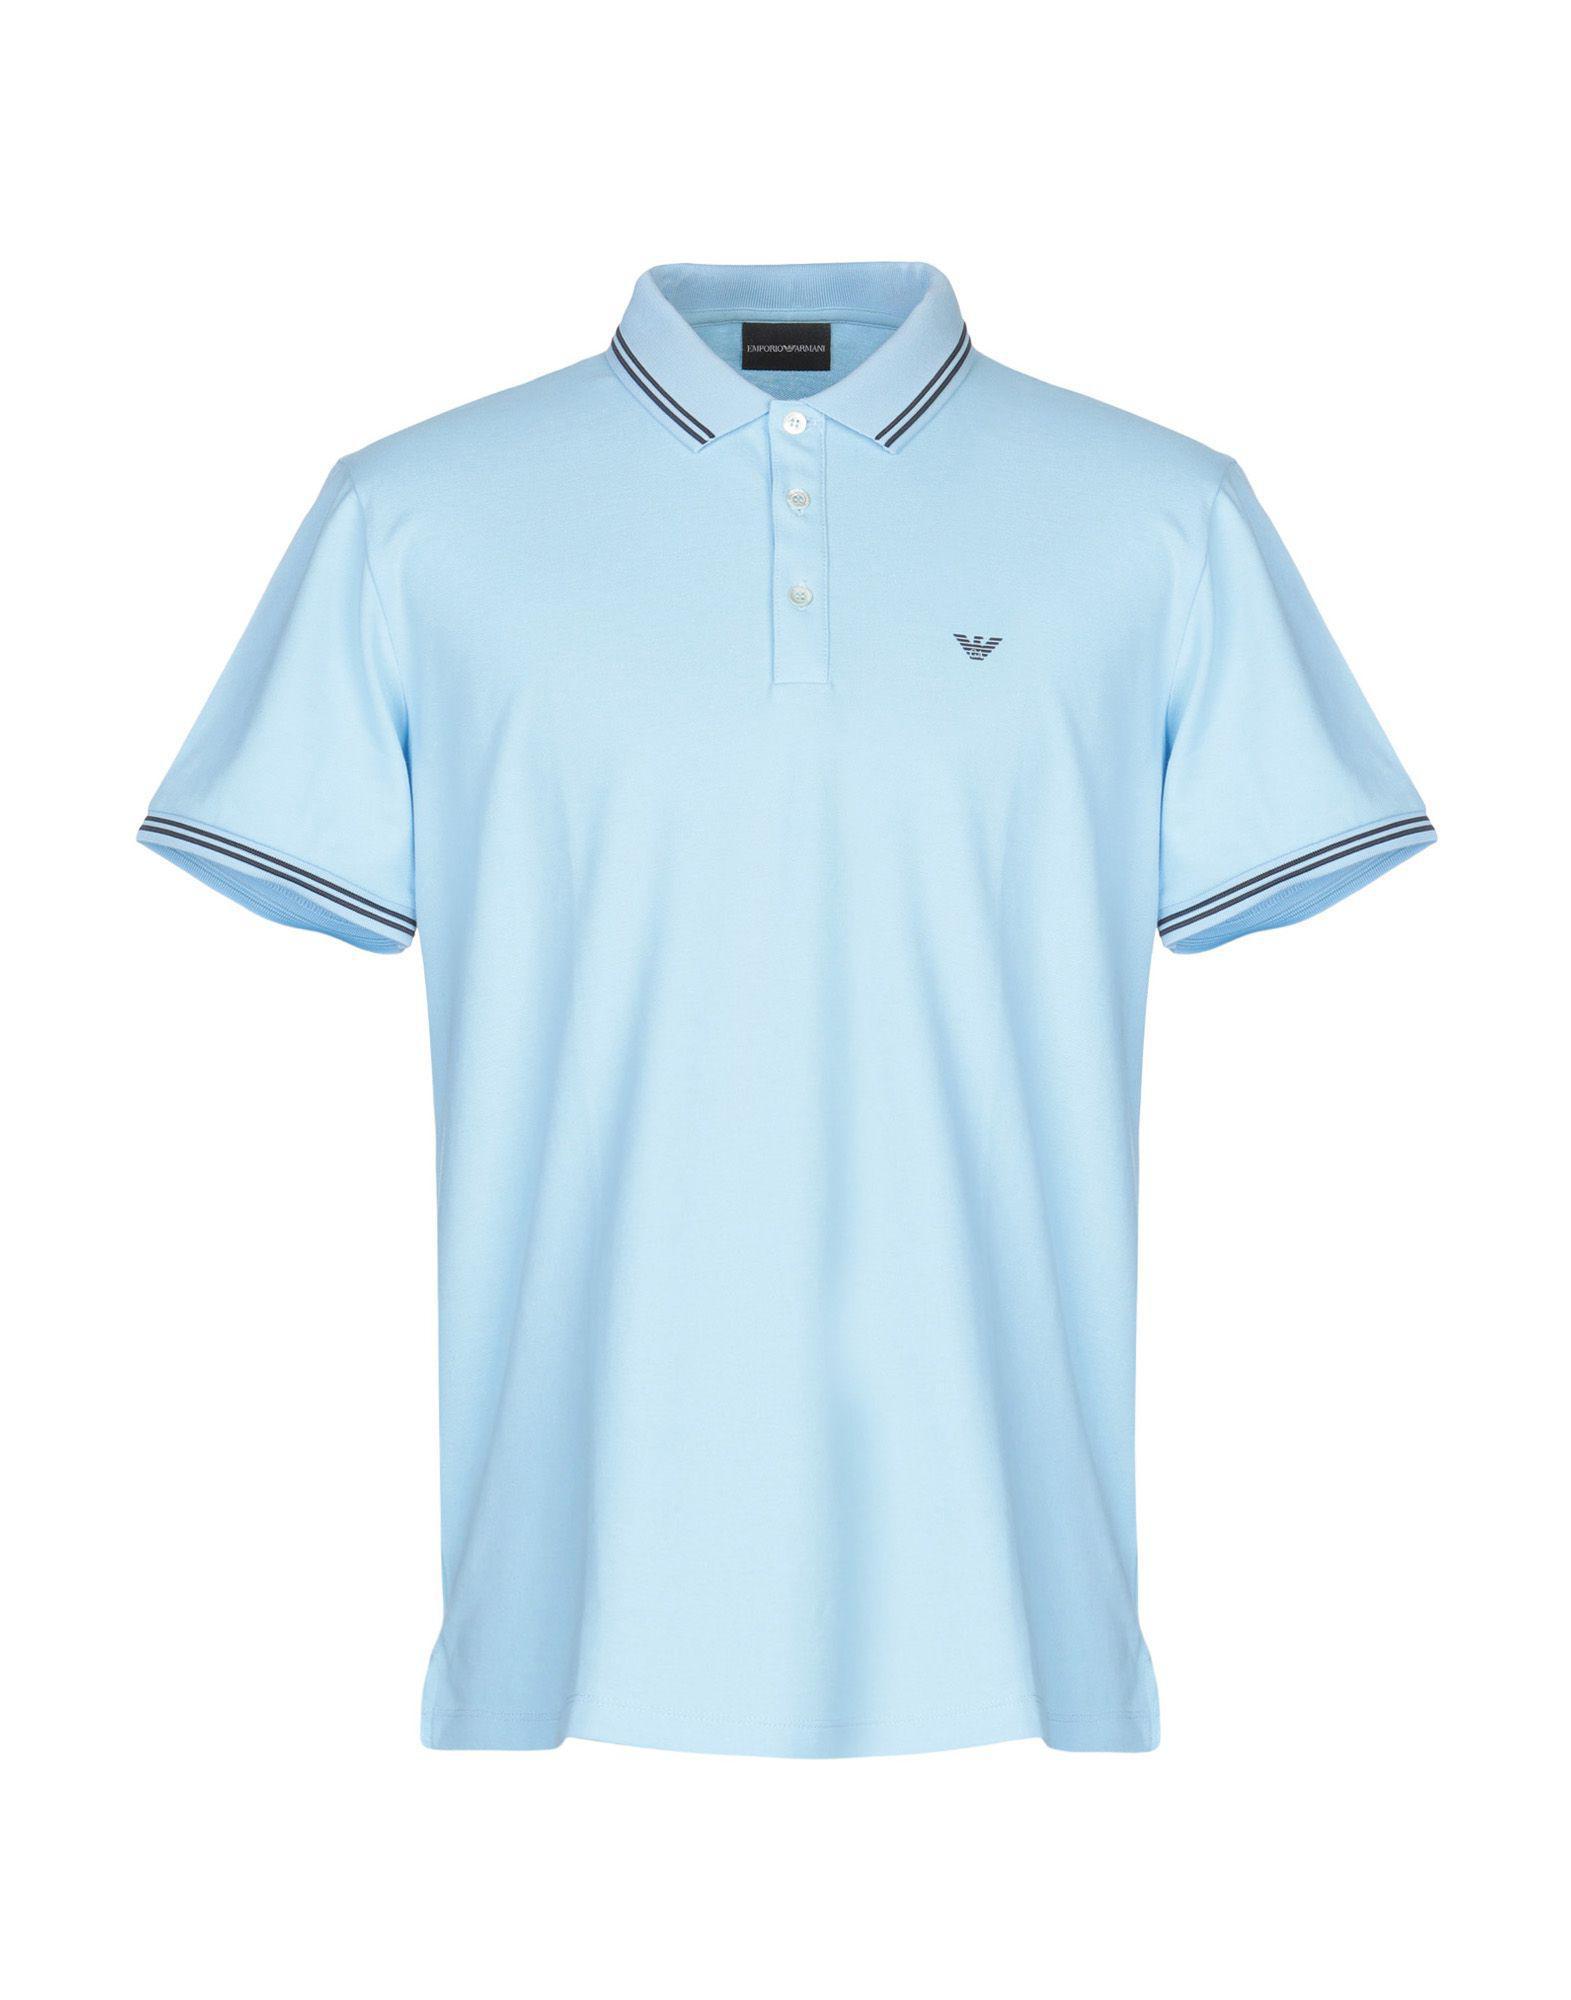 398180b5 Lyst - Emporio Armani Polo Shirt in Blue for Men